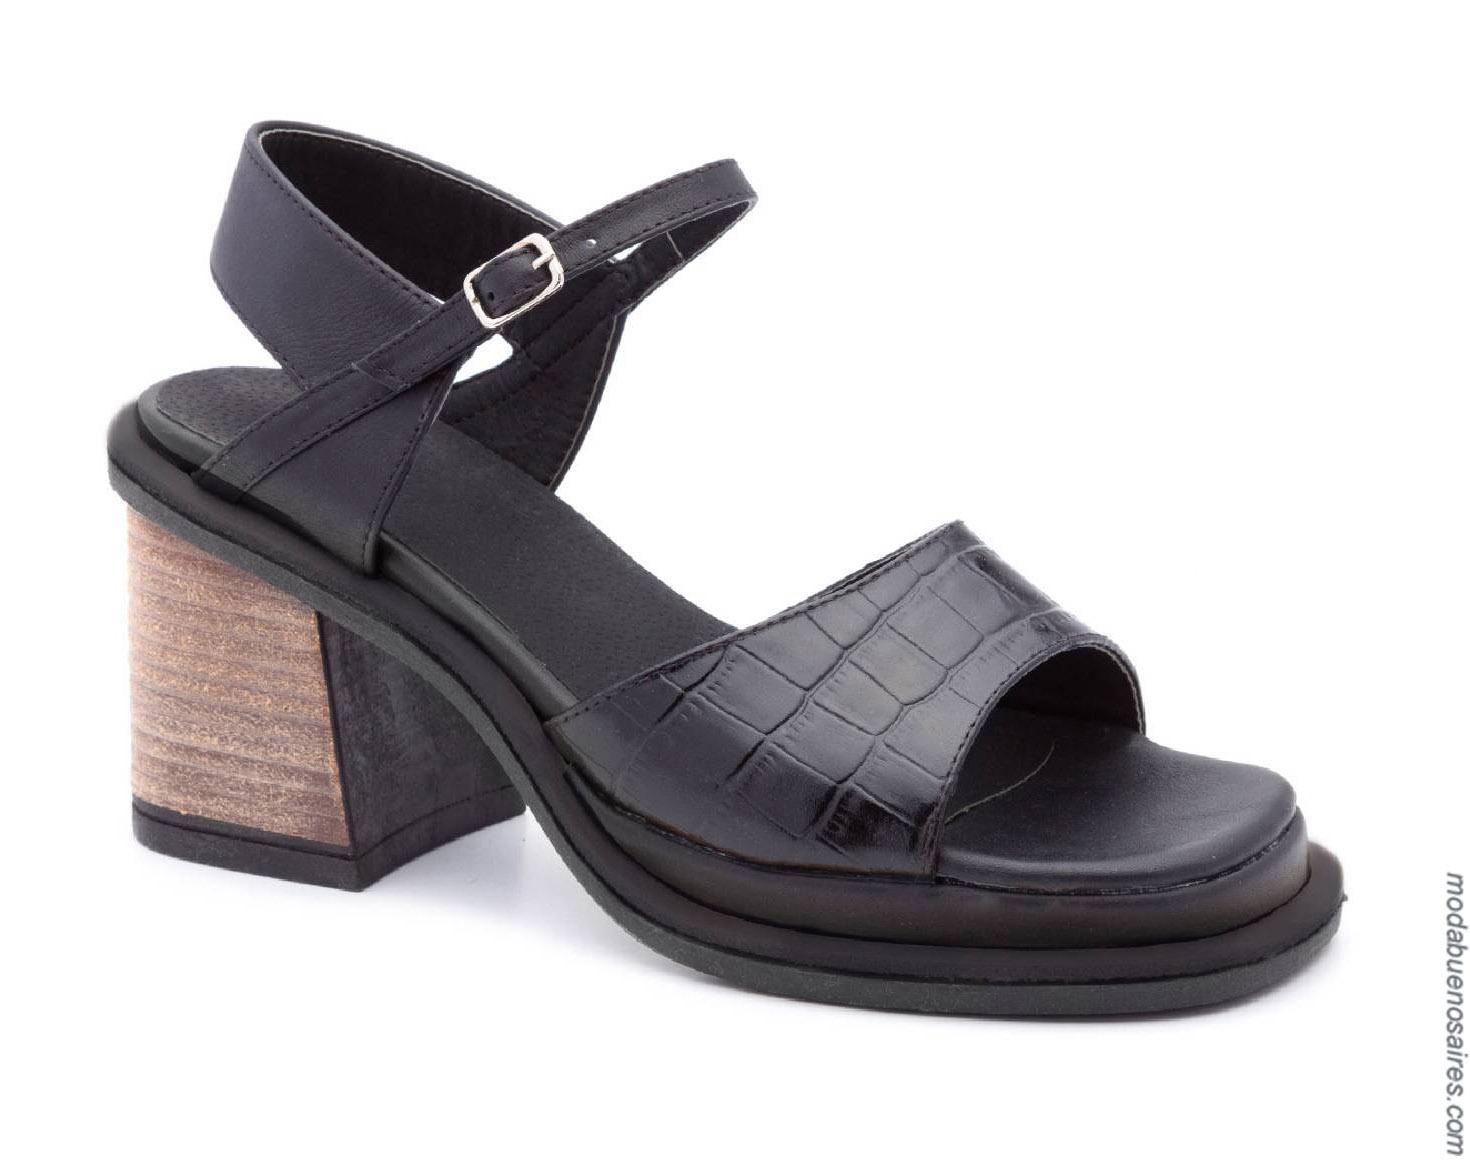 Sandalias primavera verano 2020 moda mujer. Calzado femenino primavera verano 2020.